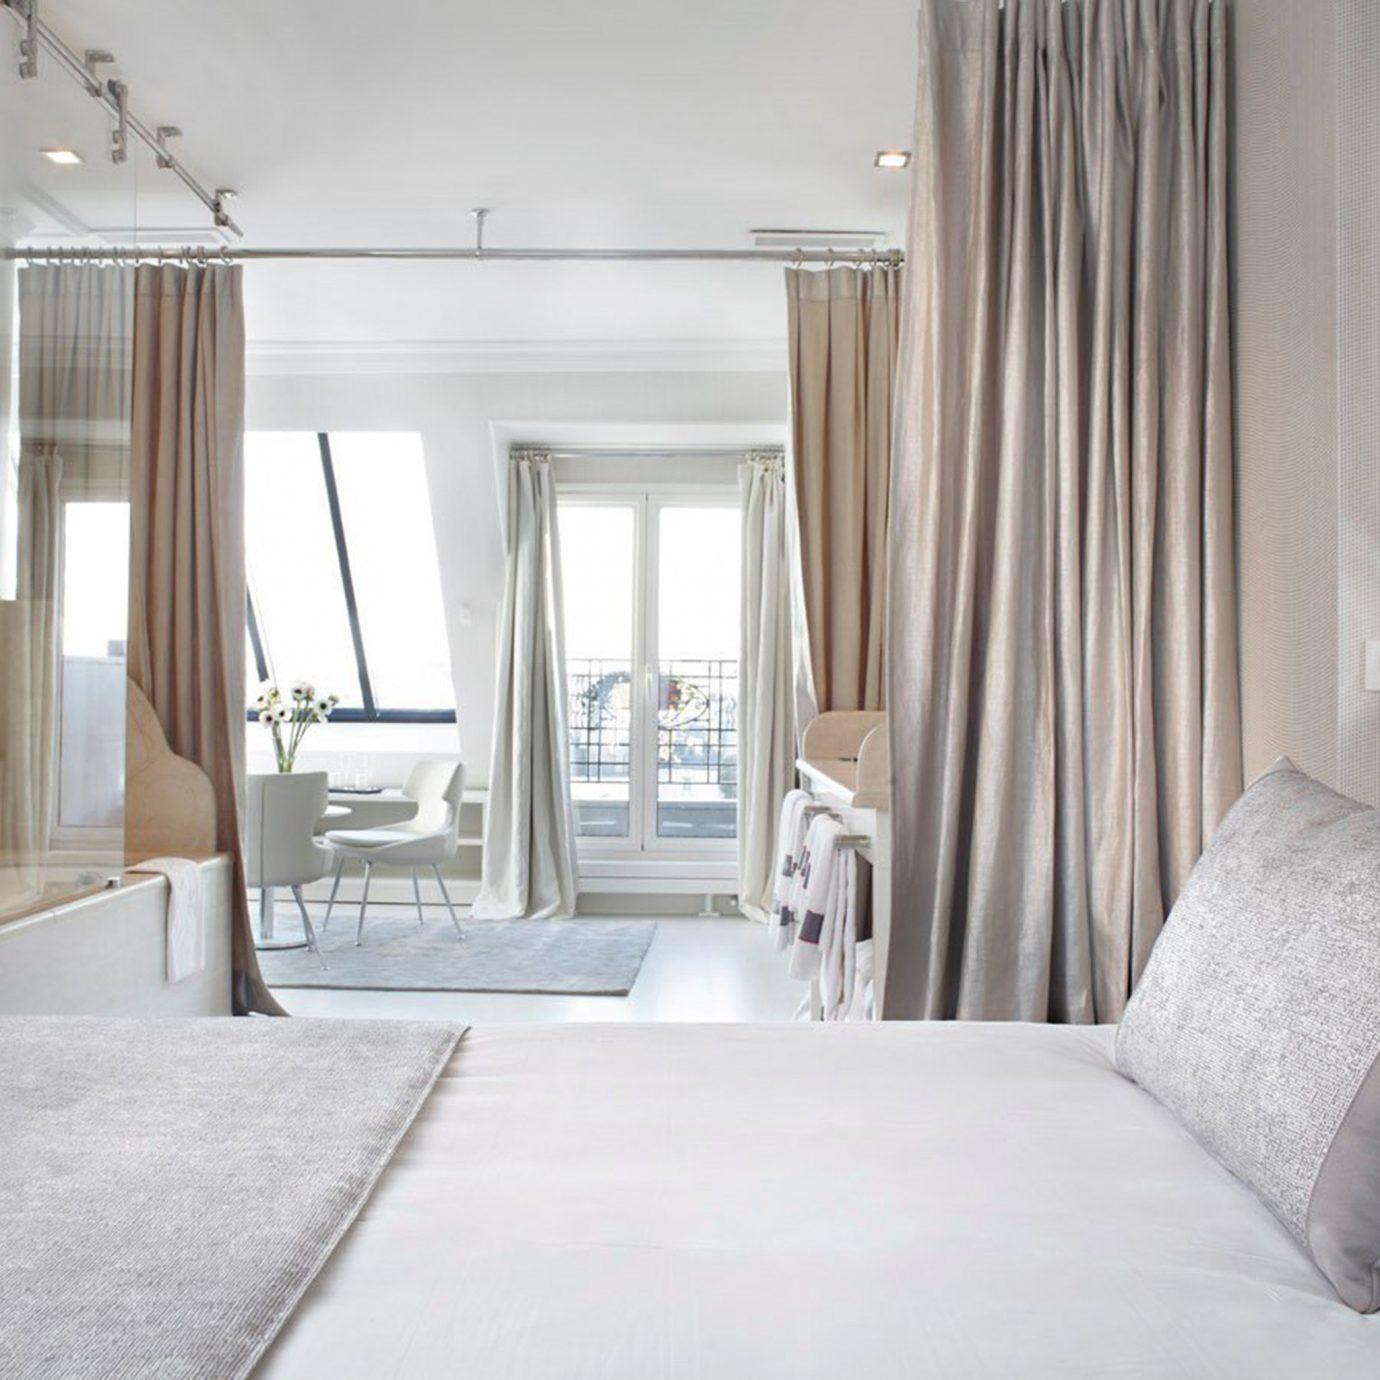 Bedroom Elegant Luxury Modern Suite property curtain scene white home cottage living room